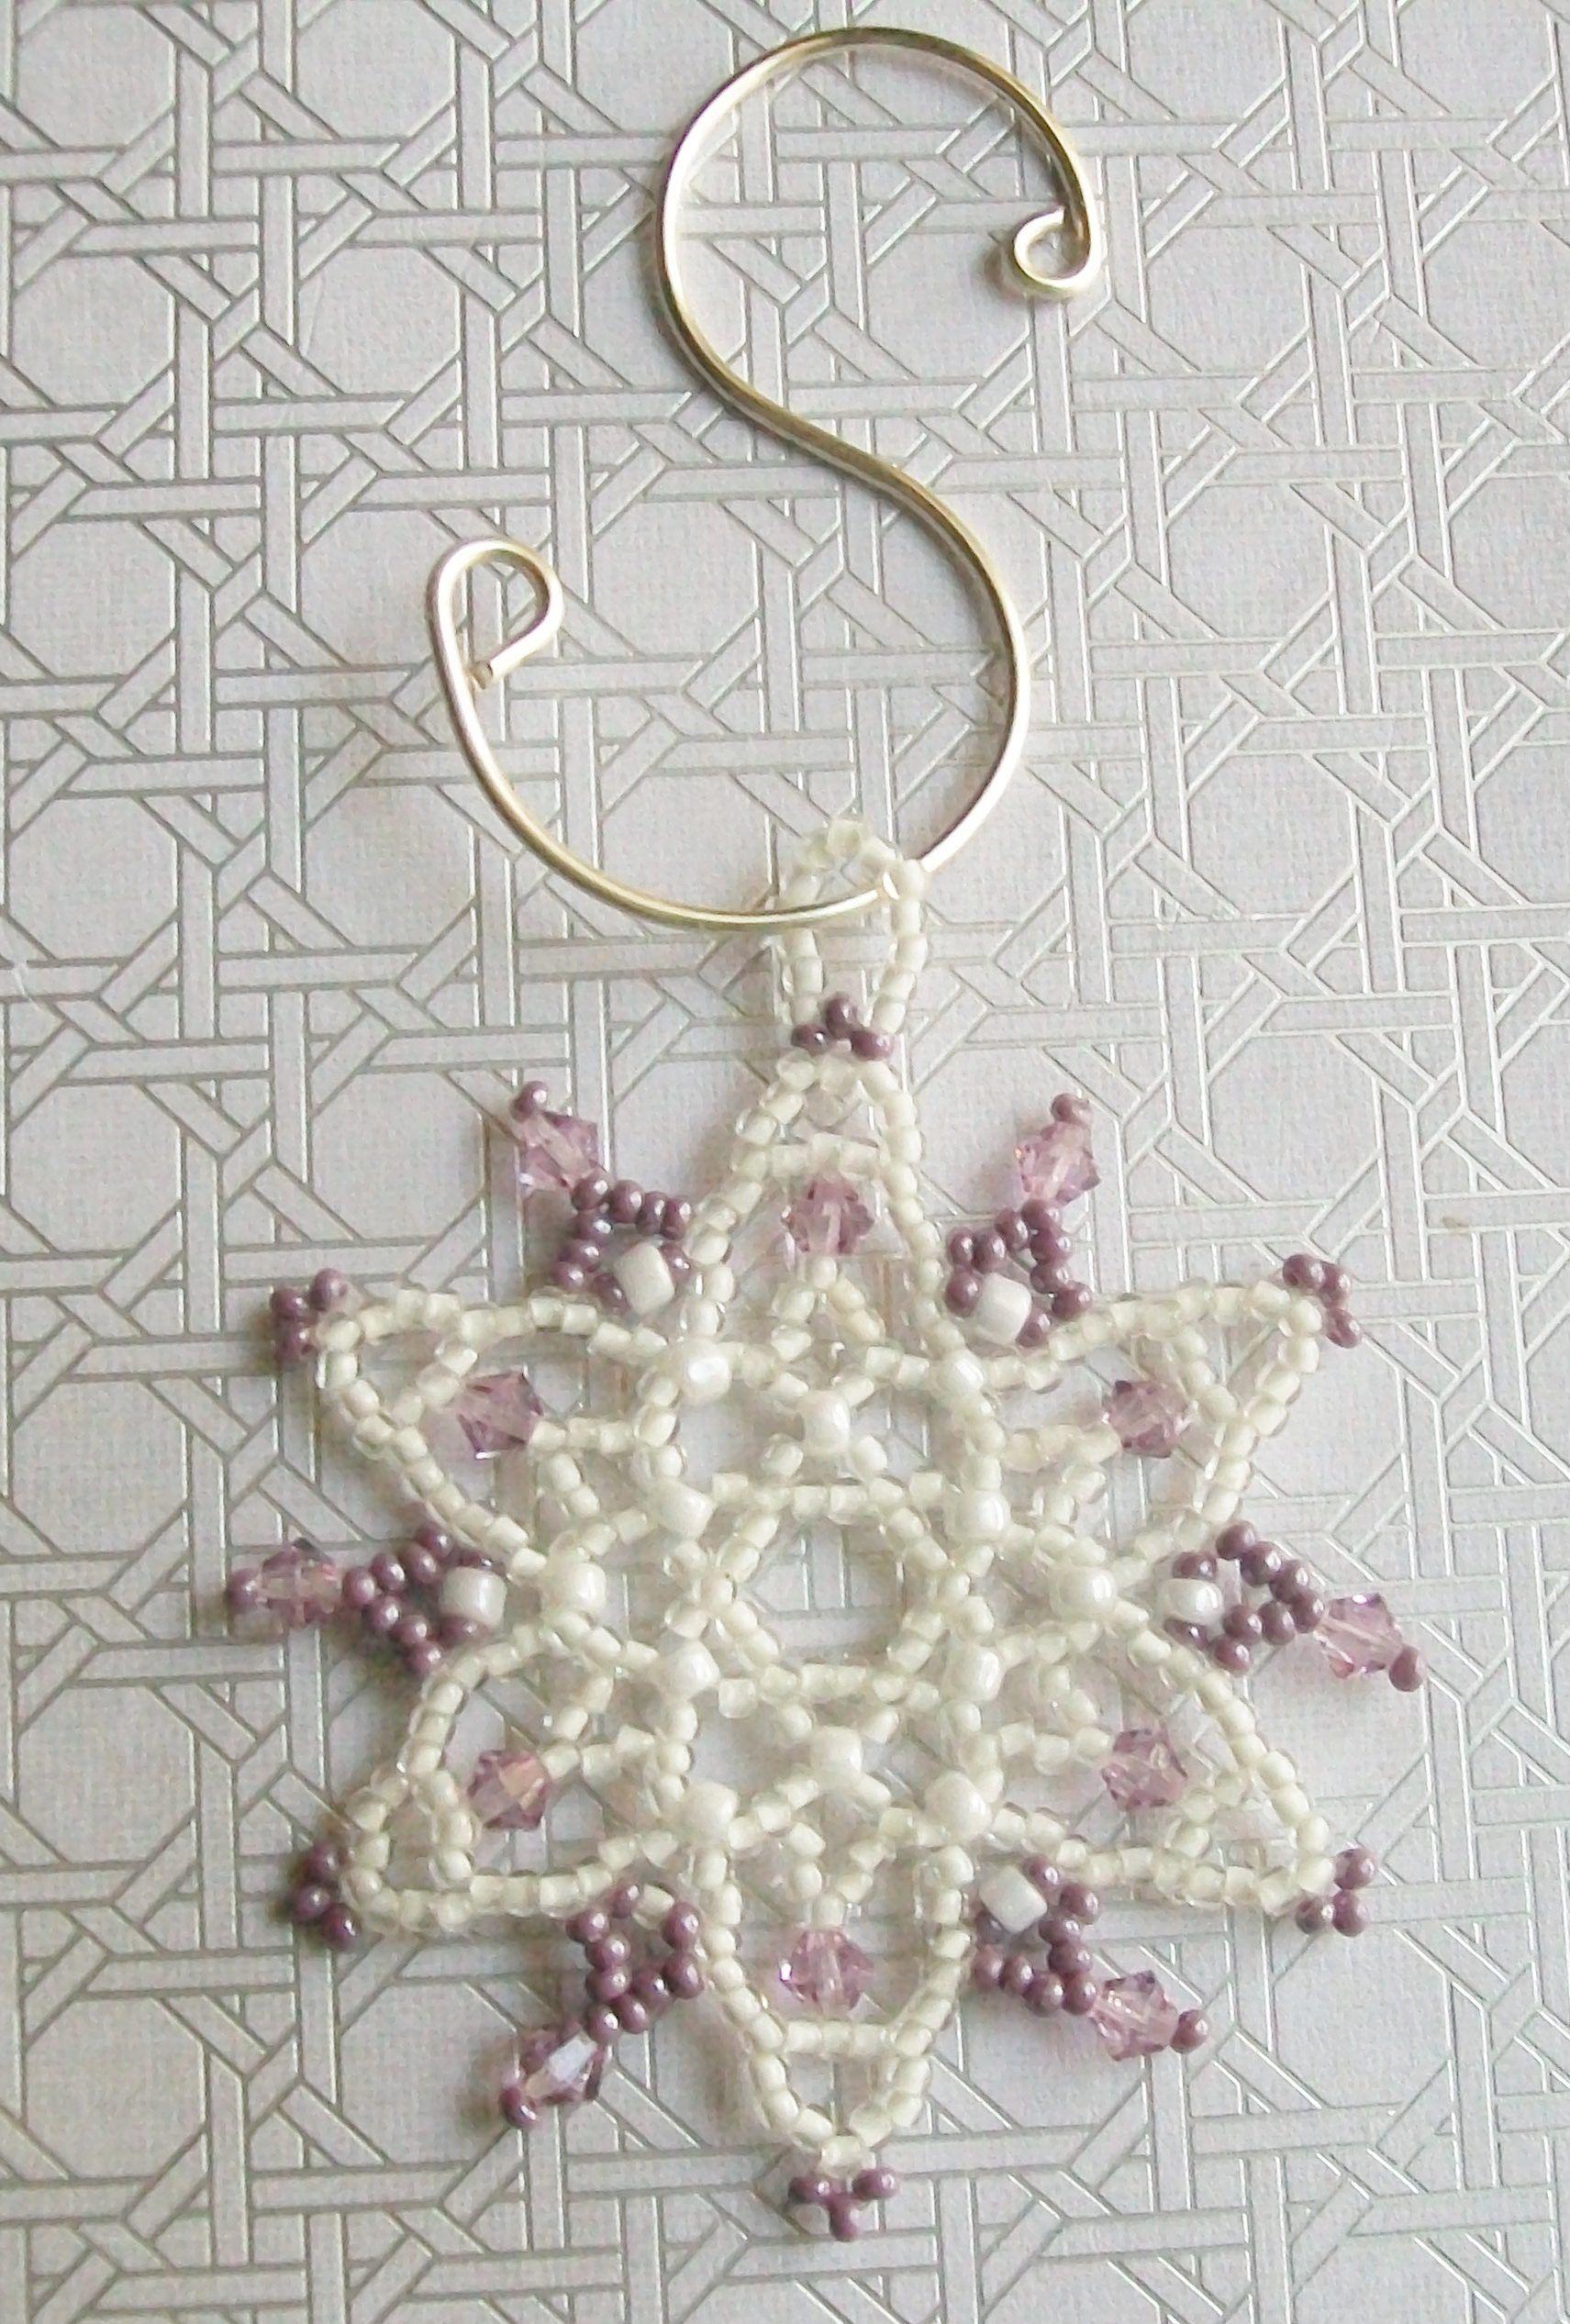 2-Inch Mini Snowflakes Makes 24 Ornaments Beadery Holiday Beaded Ornament Kit